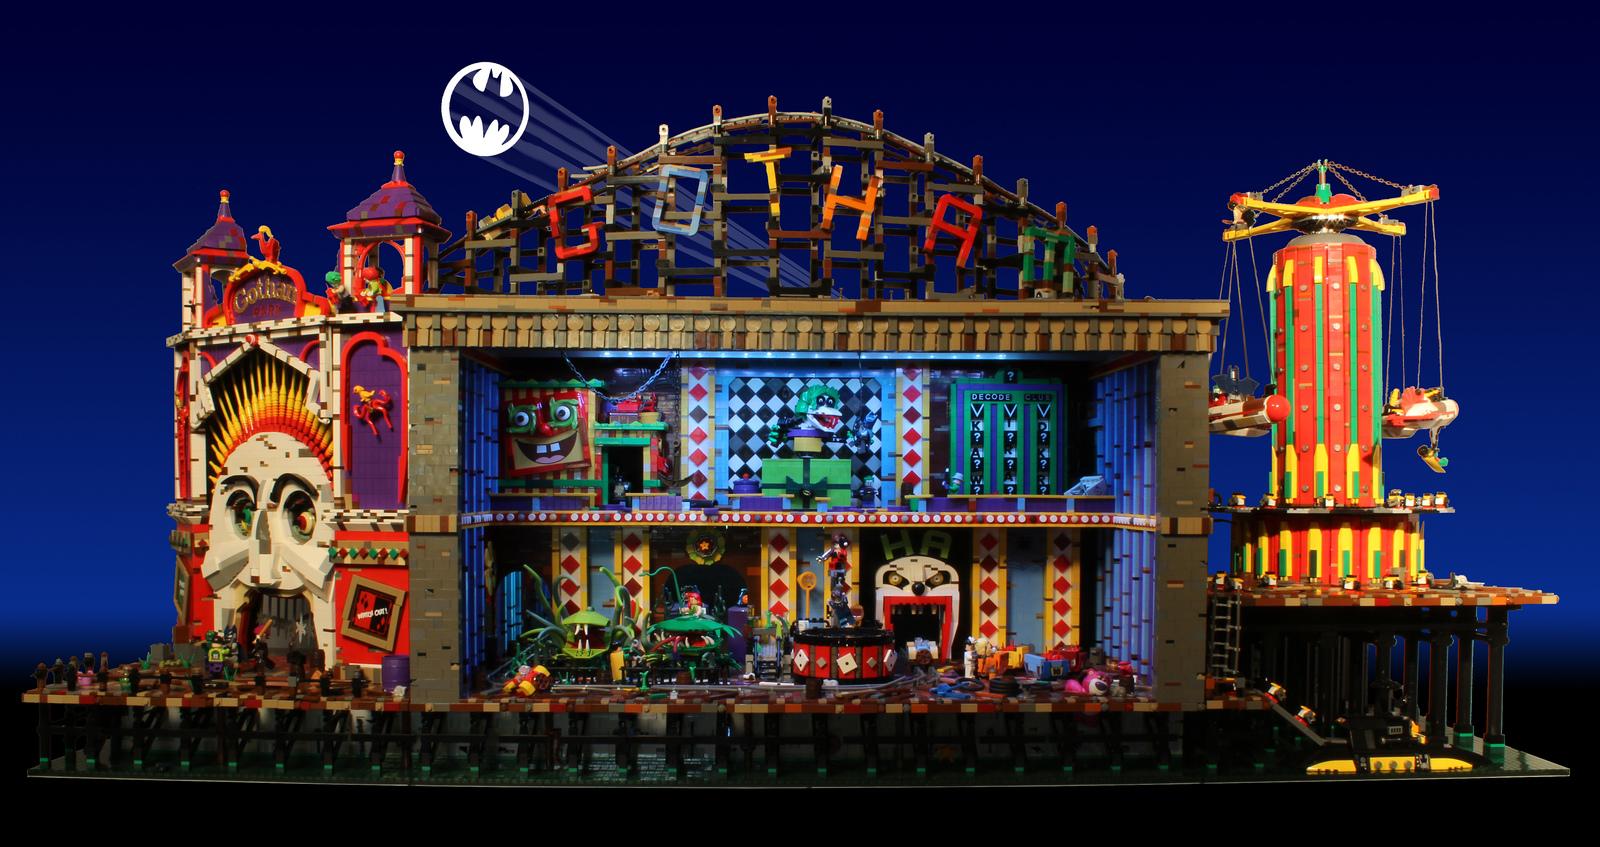 Lego Joker's Funhouse